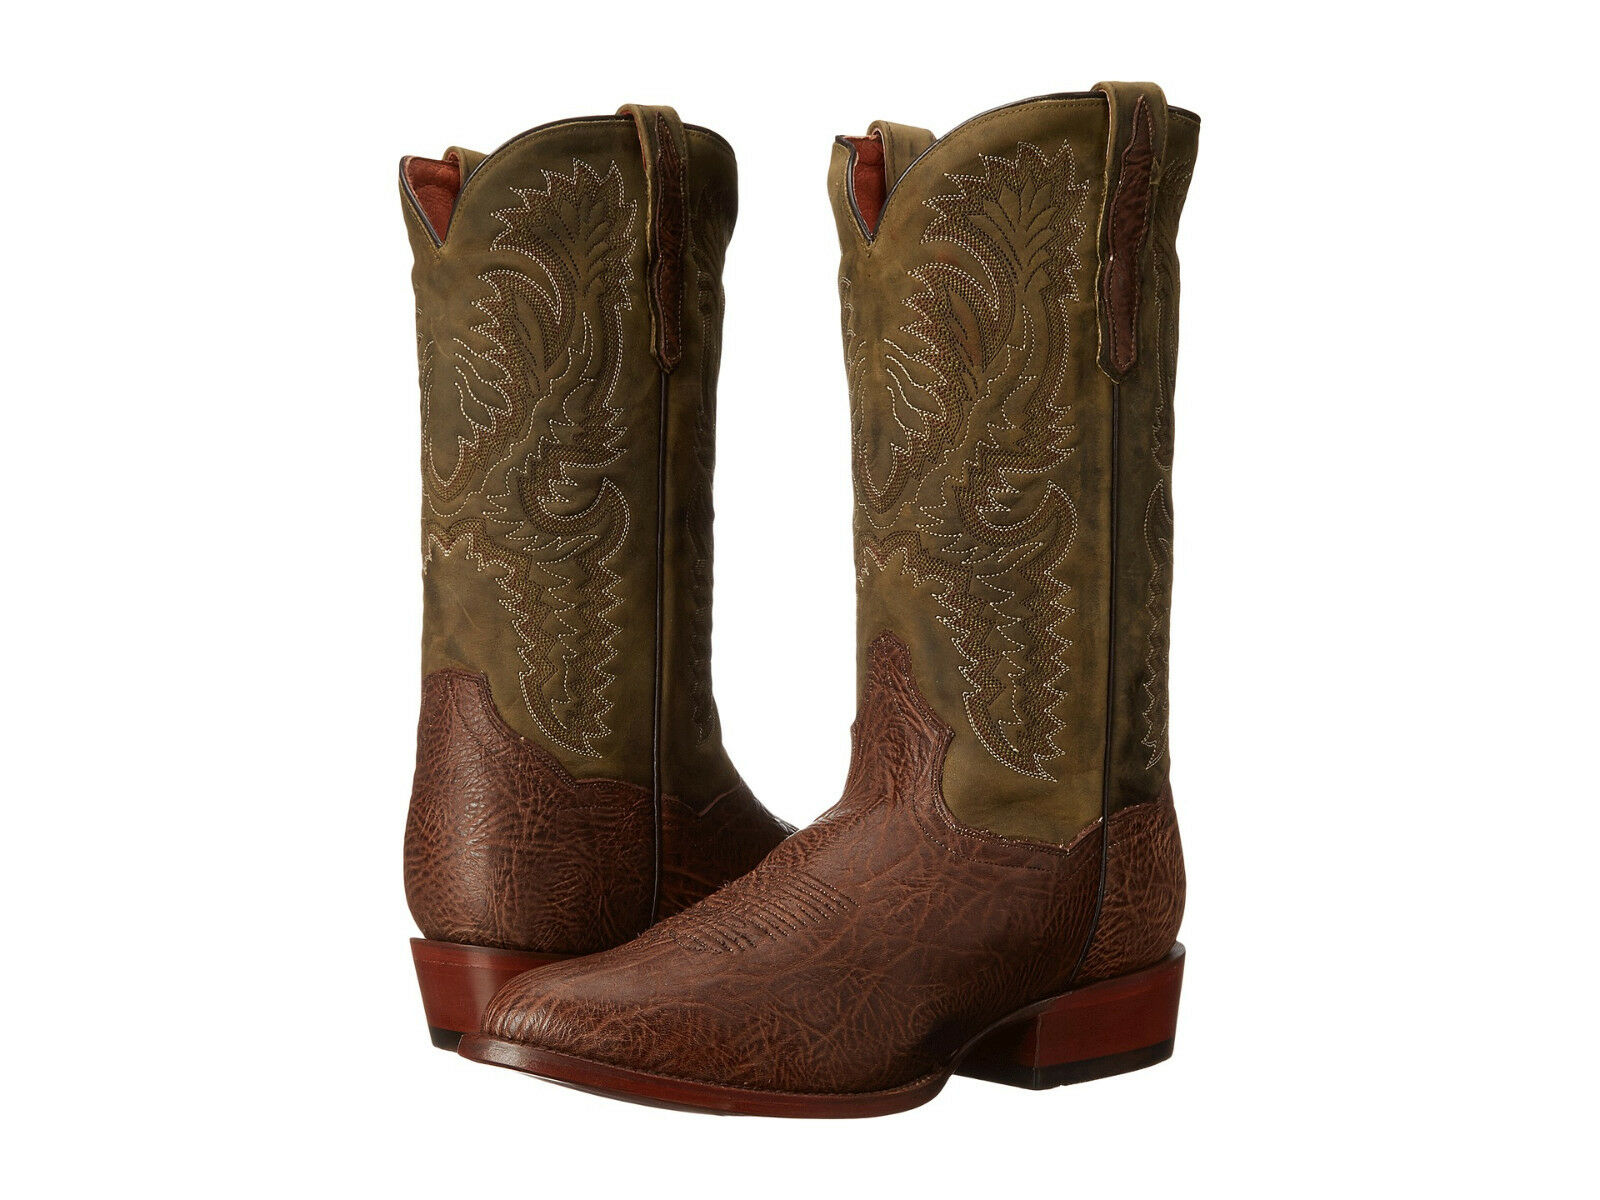 Dan Post Men's DP2195 US 11 D Brown & Green Leather Cowboy Western Boots 250